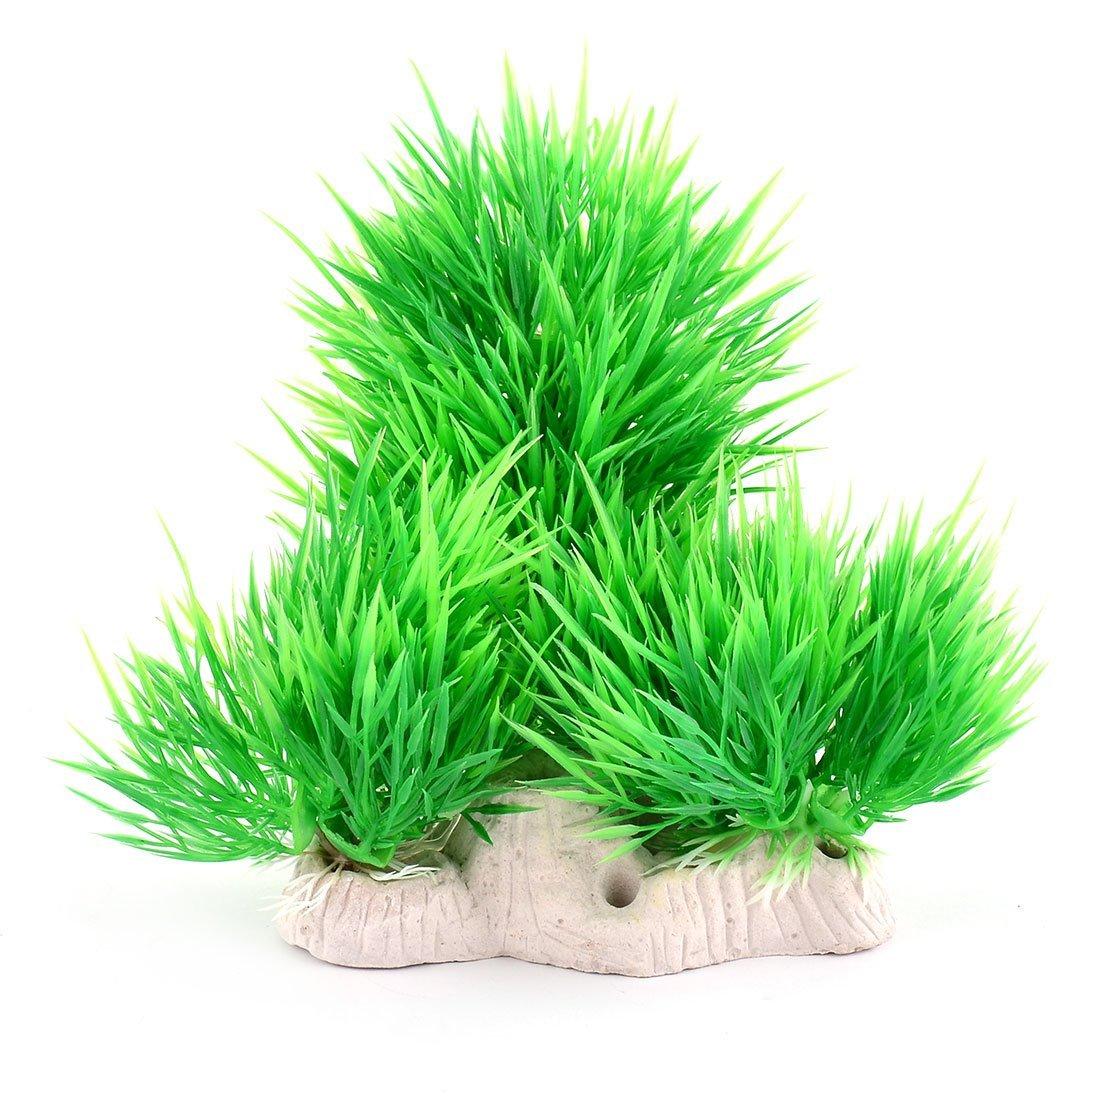 Fish Bowl Tank Landscape Artificial Plant Decor Grass 8 Inch Height 5pcs